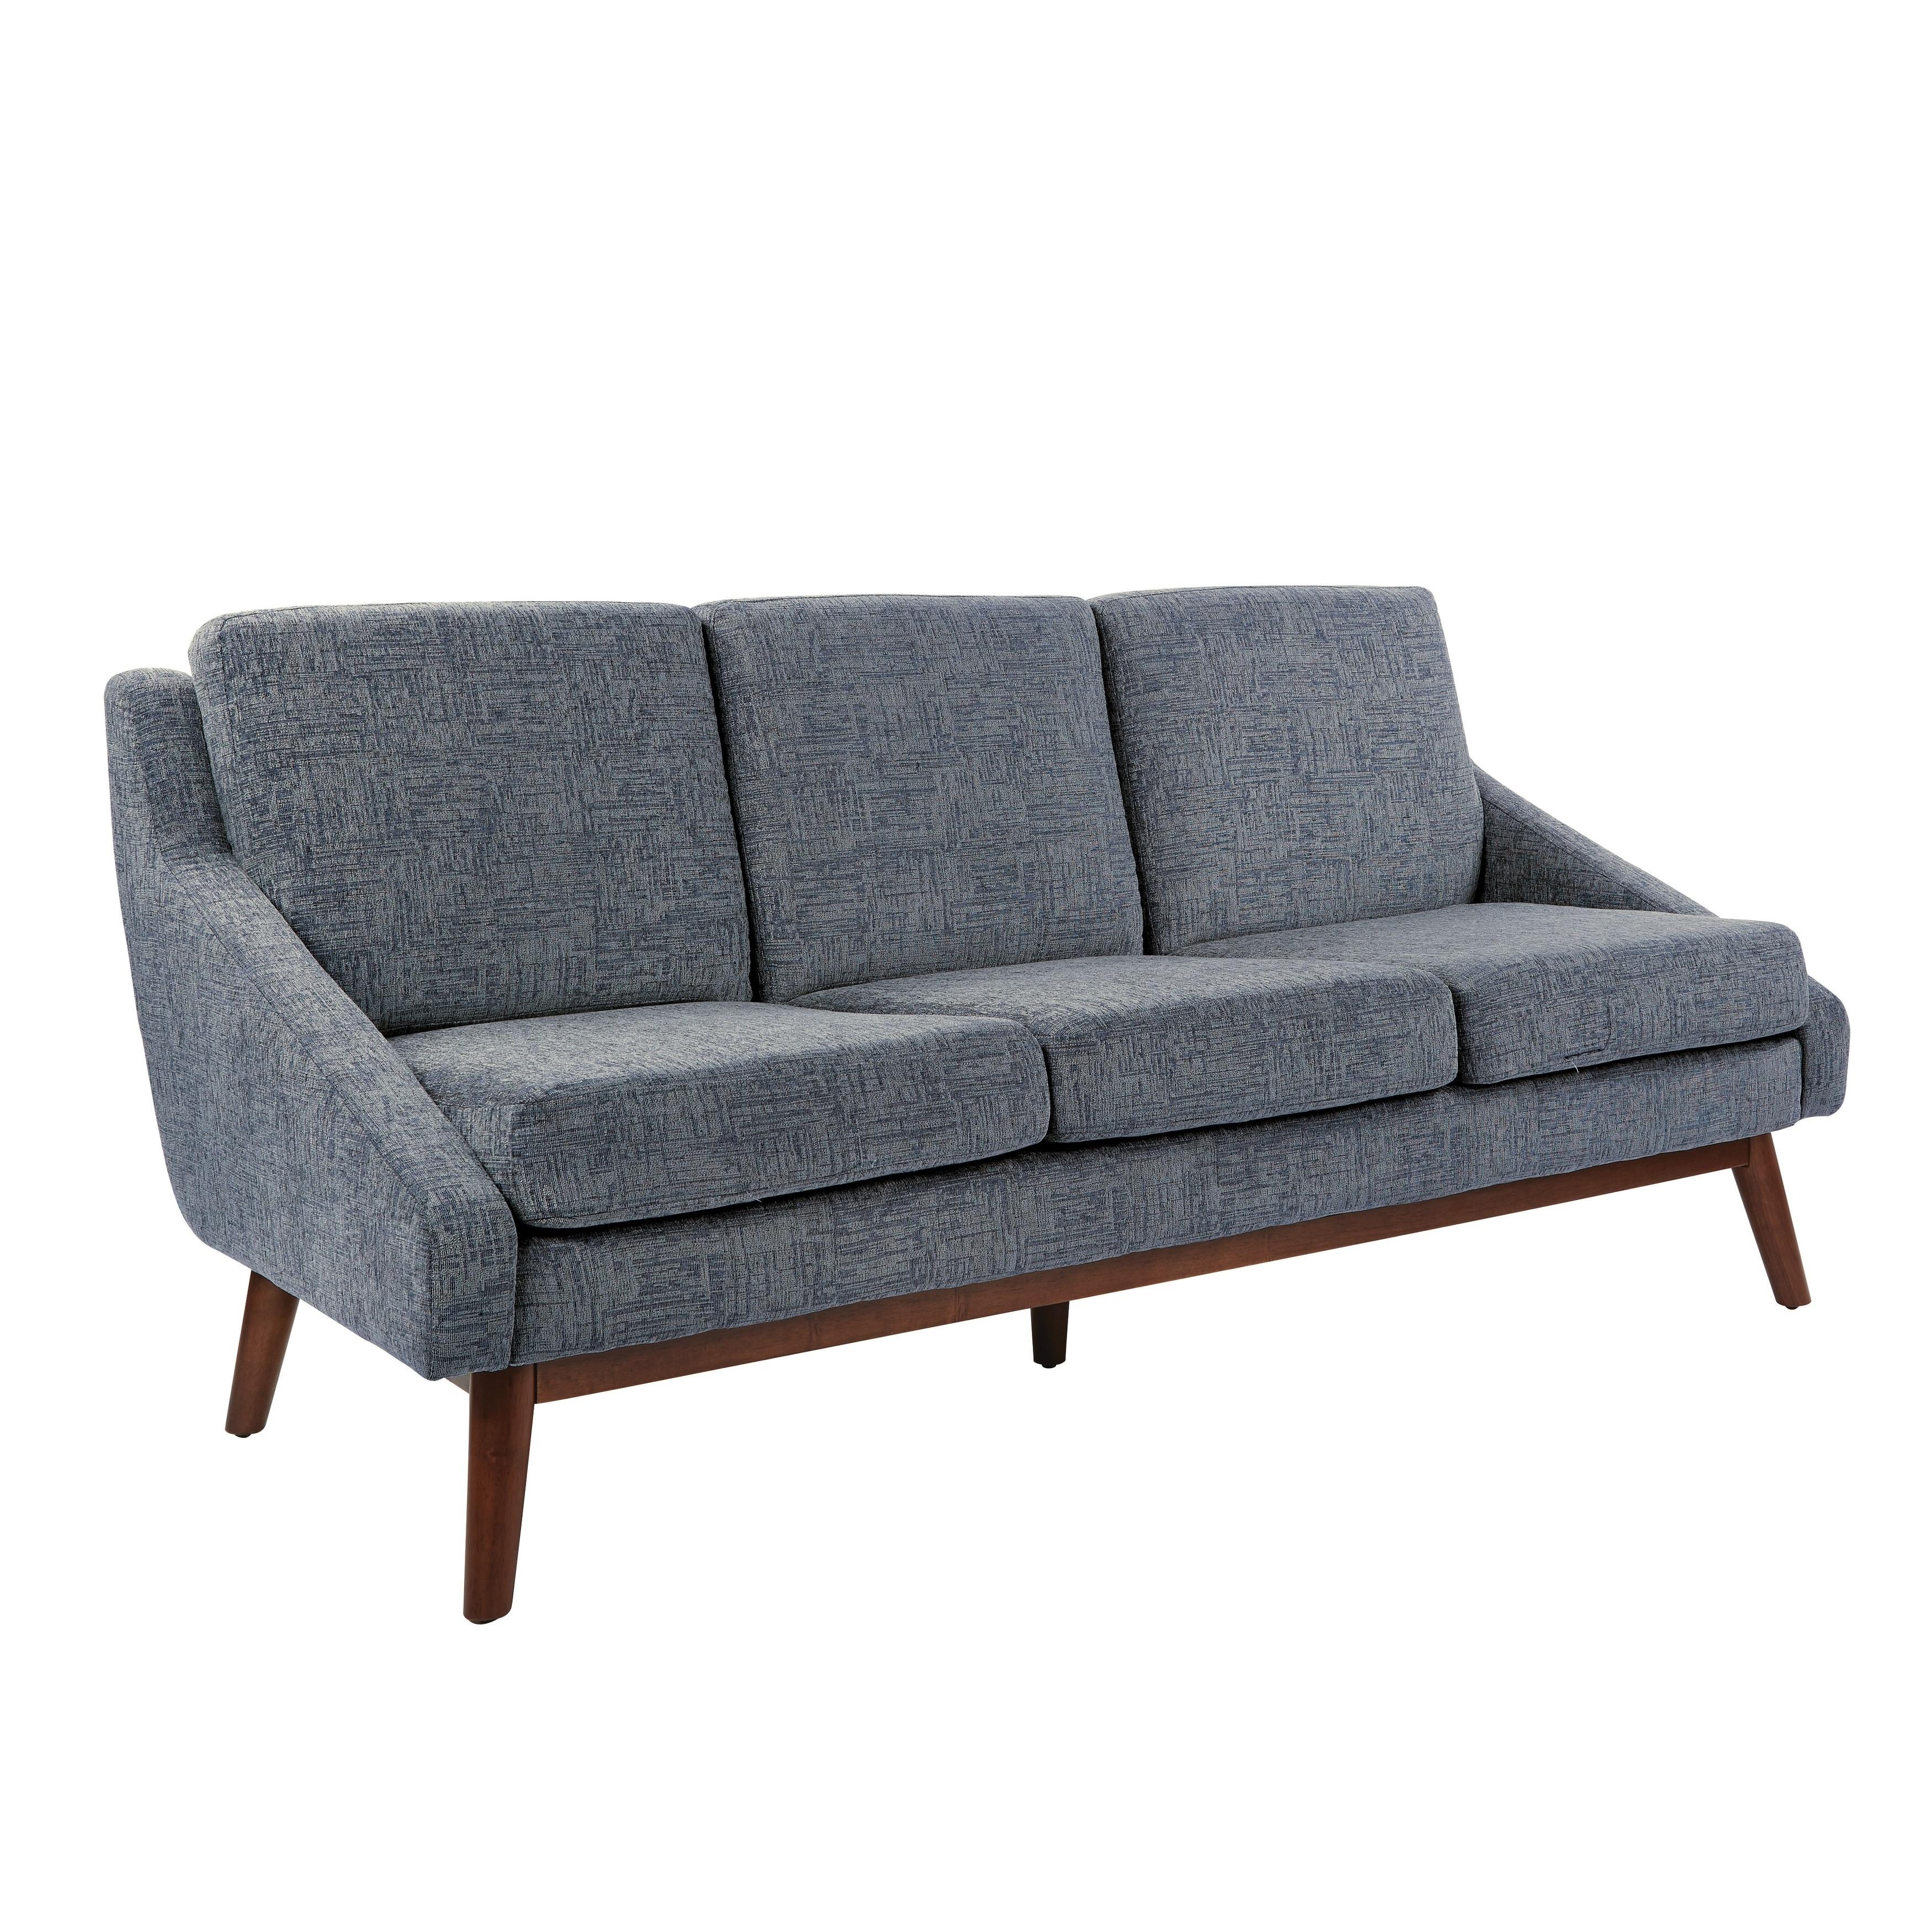 OSP Home Furnishings Davenport Blue/Green/Grey Wood/Fabric Sofa